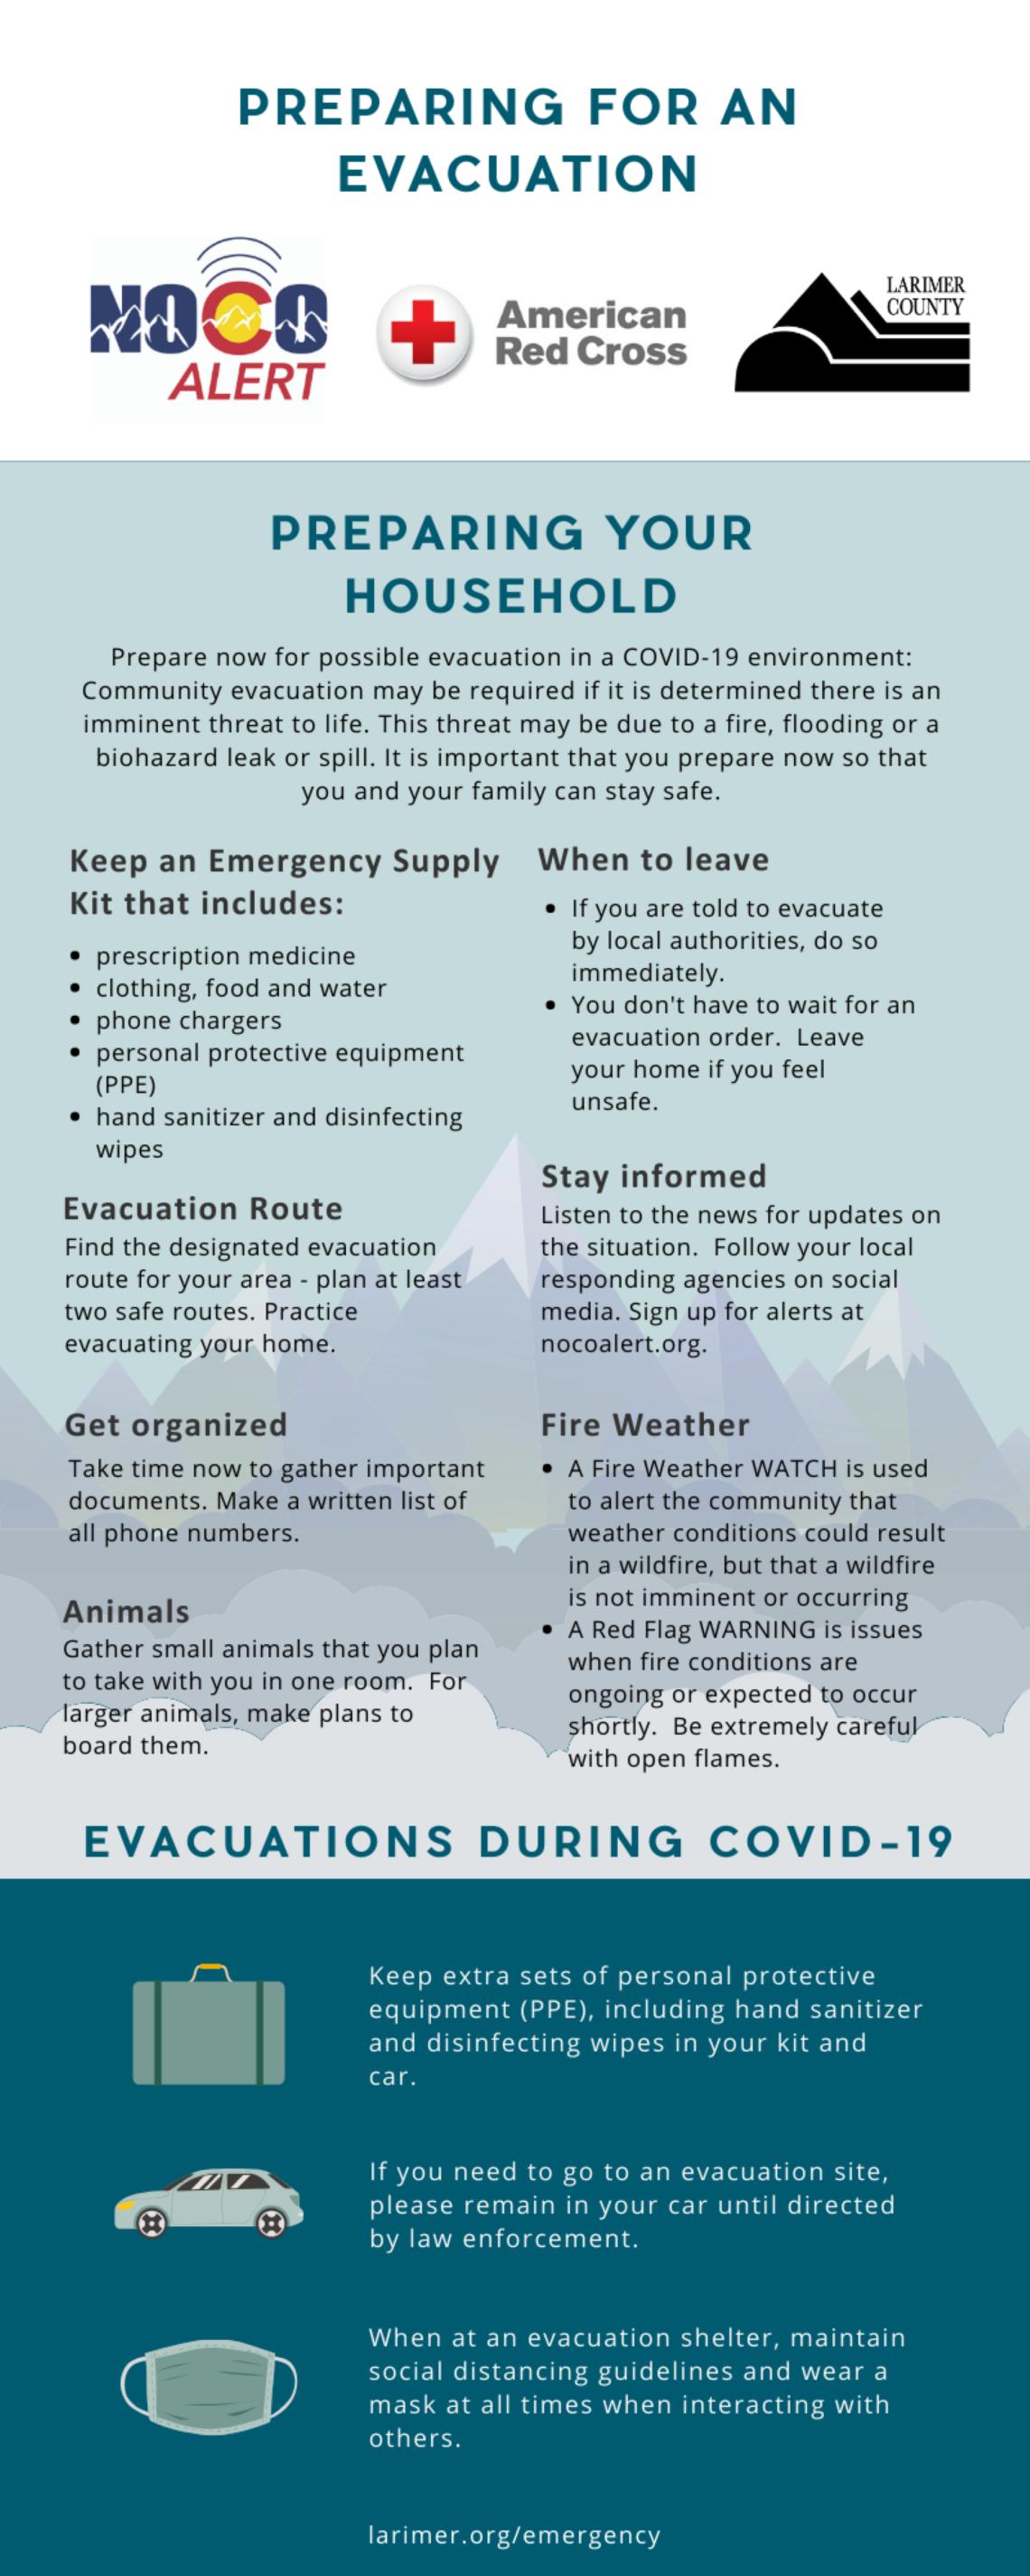 Evacuation Tips with COVID